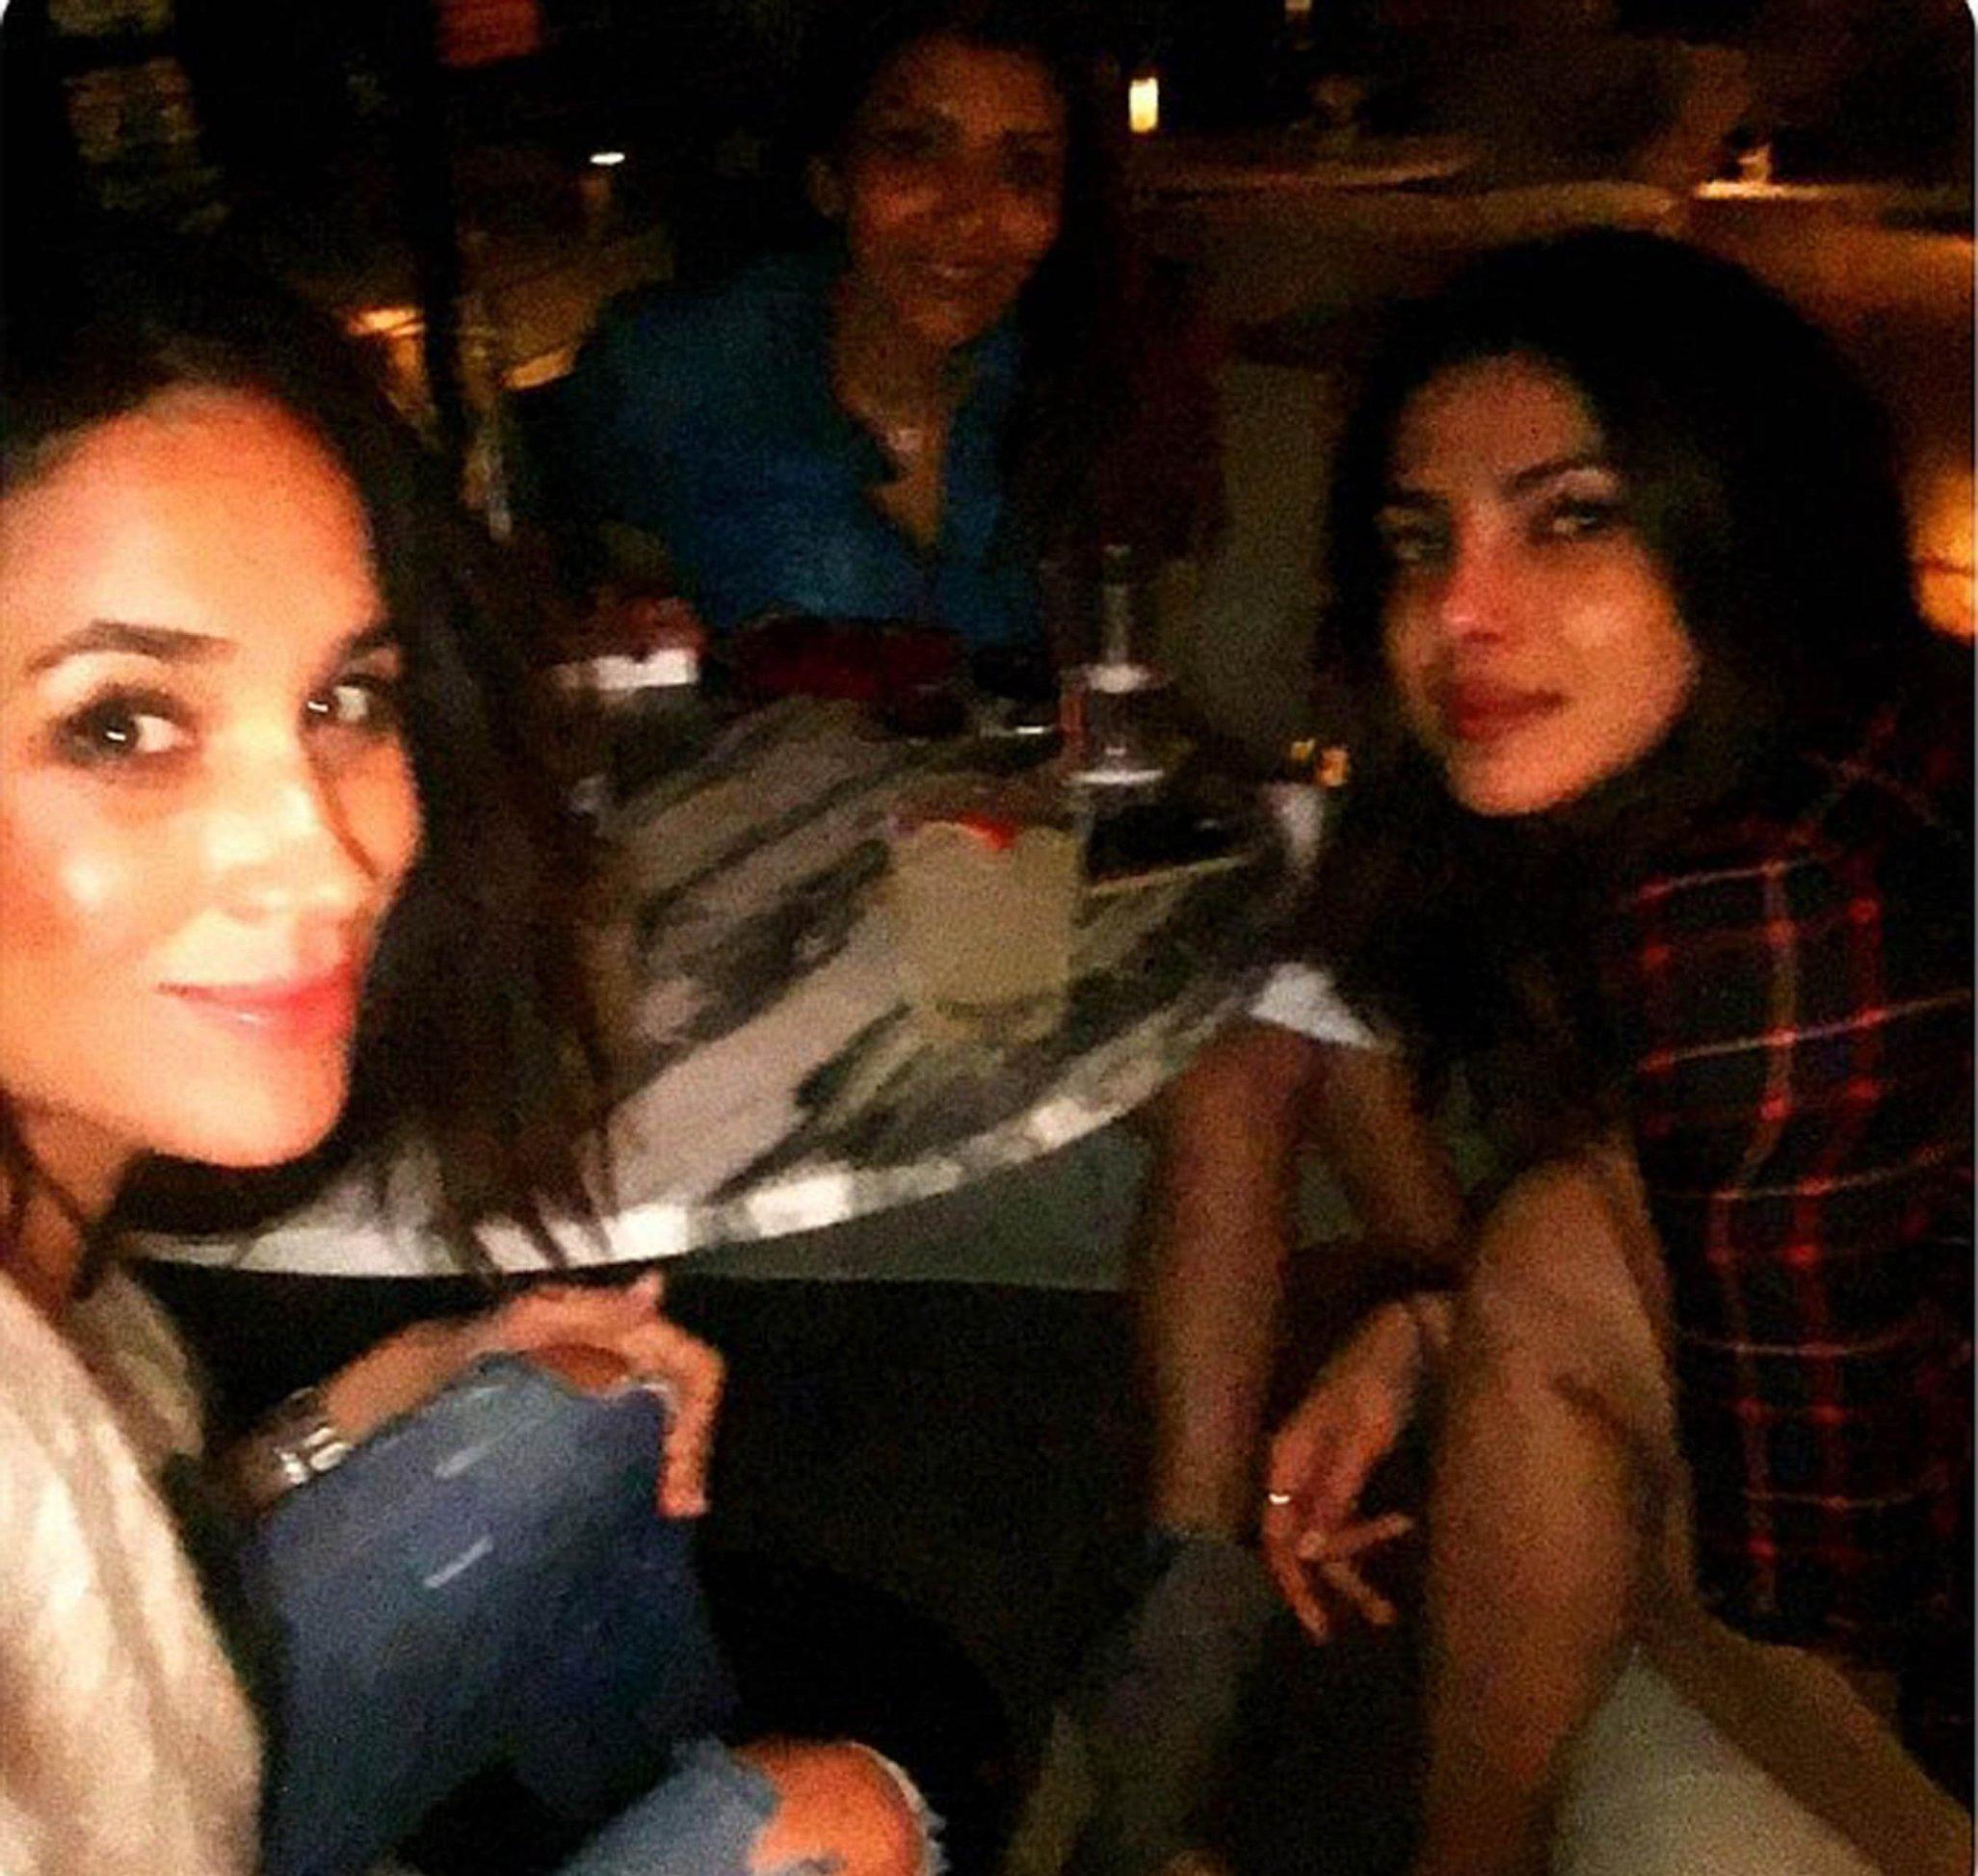 01-12-2016  Celebrity Selfies   Pictured: Priyanka Chopra Meghan Markle, Image: 307321501, License: Rights-managed, Restrictions: , Model Release: no, Credit line: Profimedia, Planet